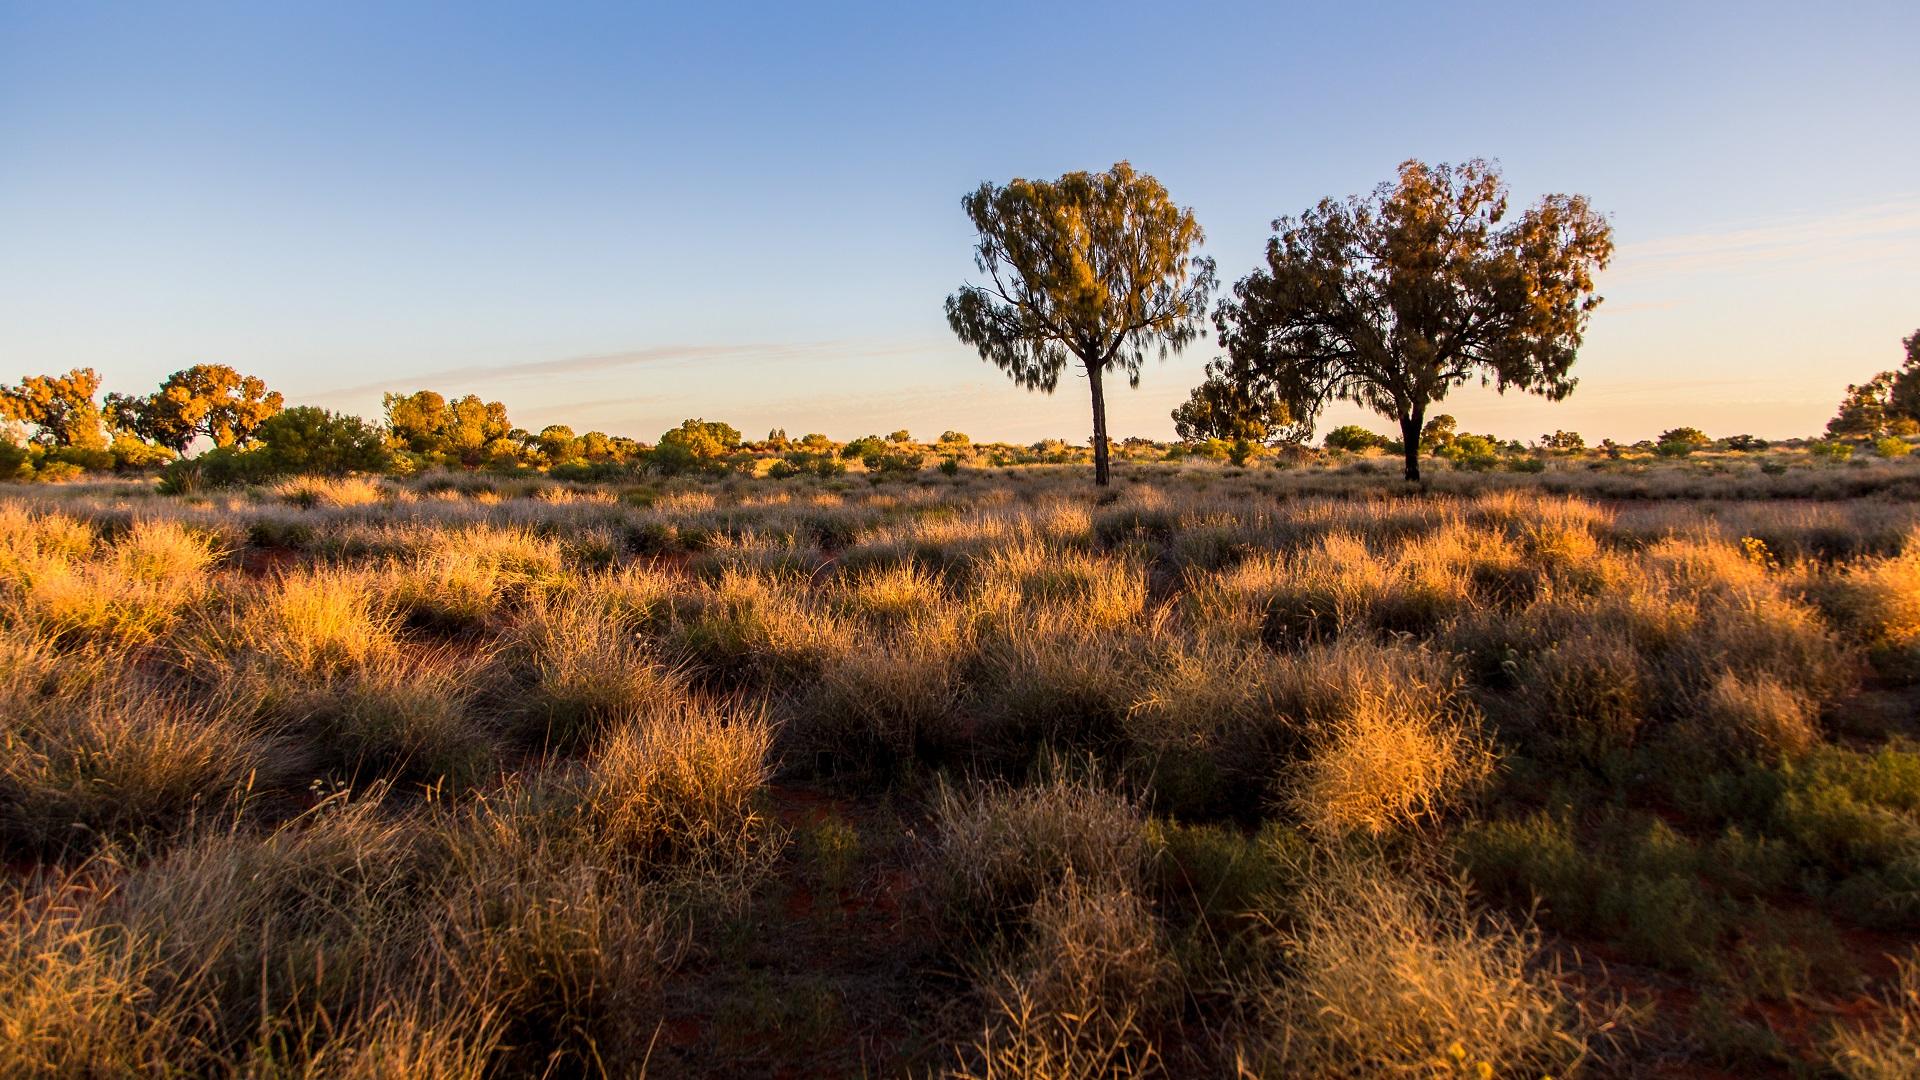 Australian bushland and trees landscape